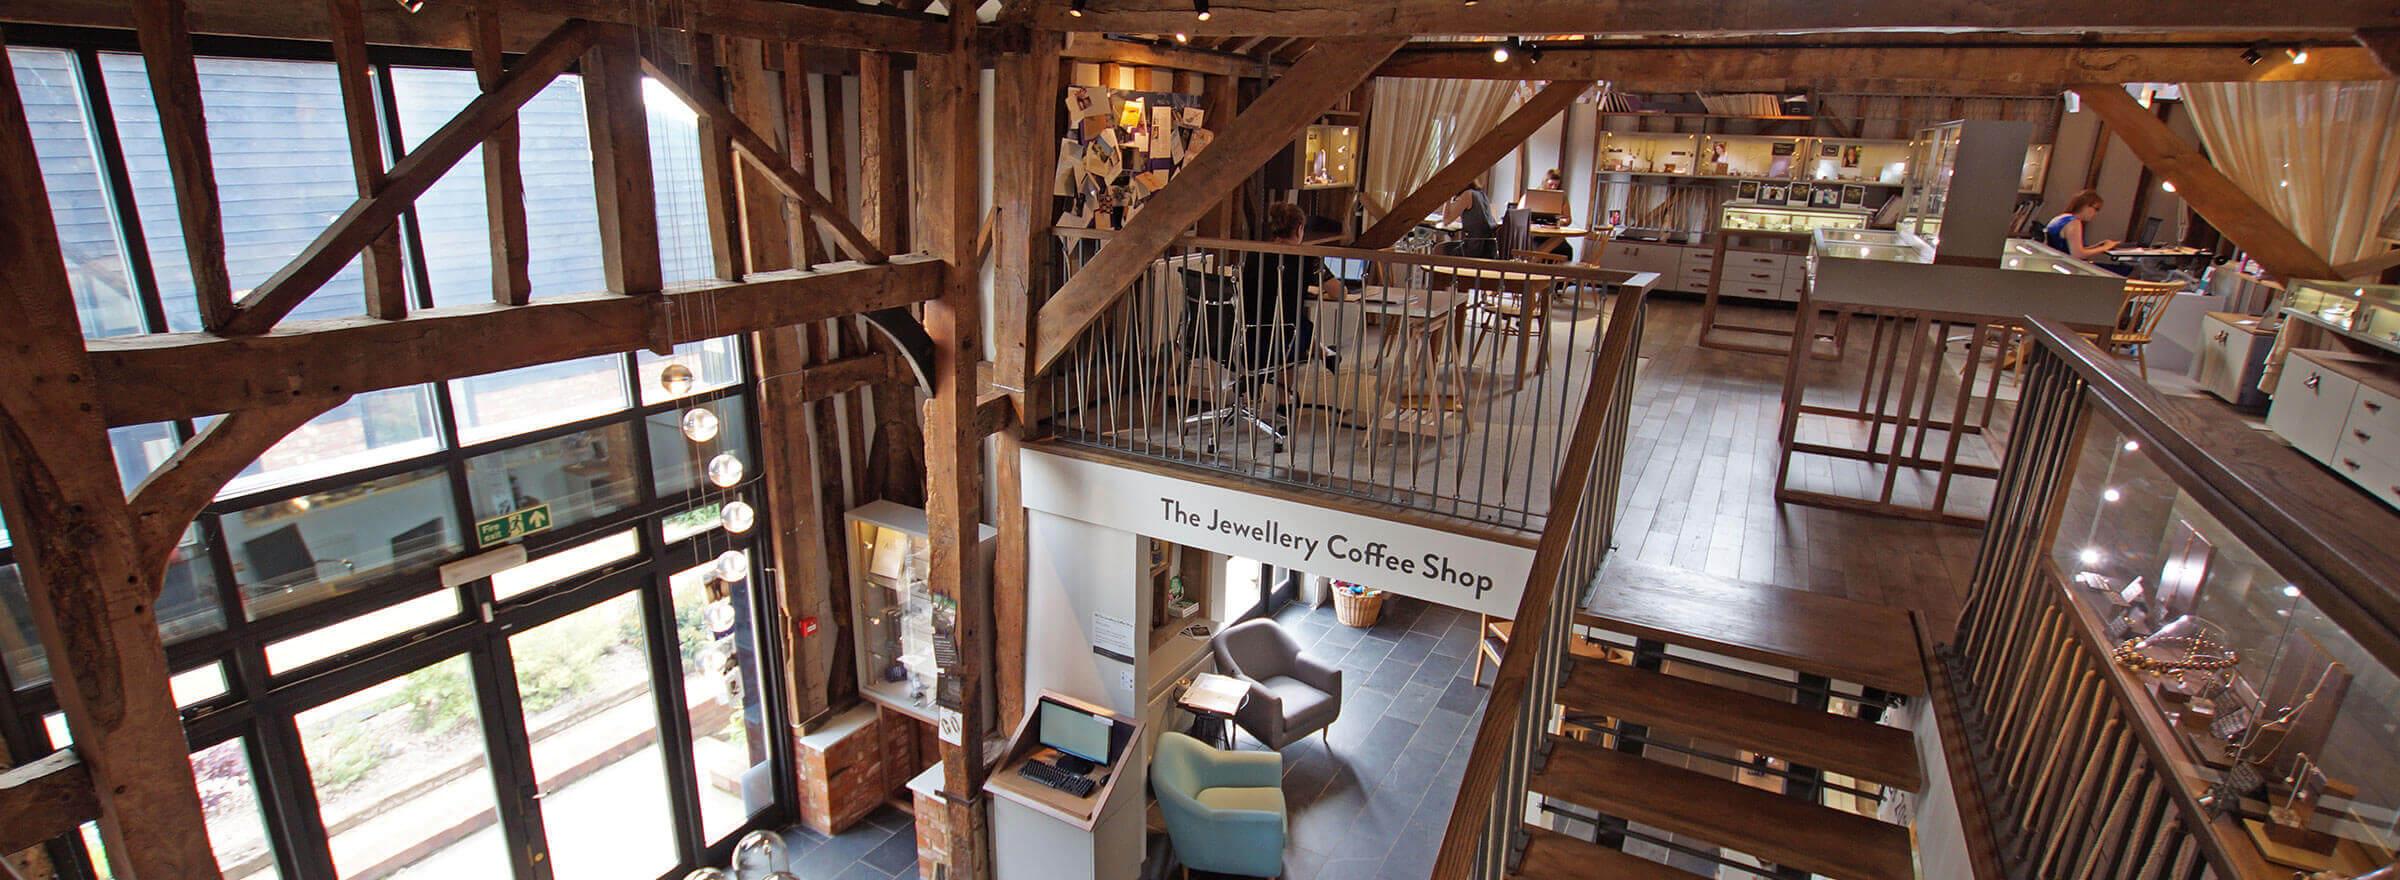 Hertfordshire Jewellery Centre